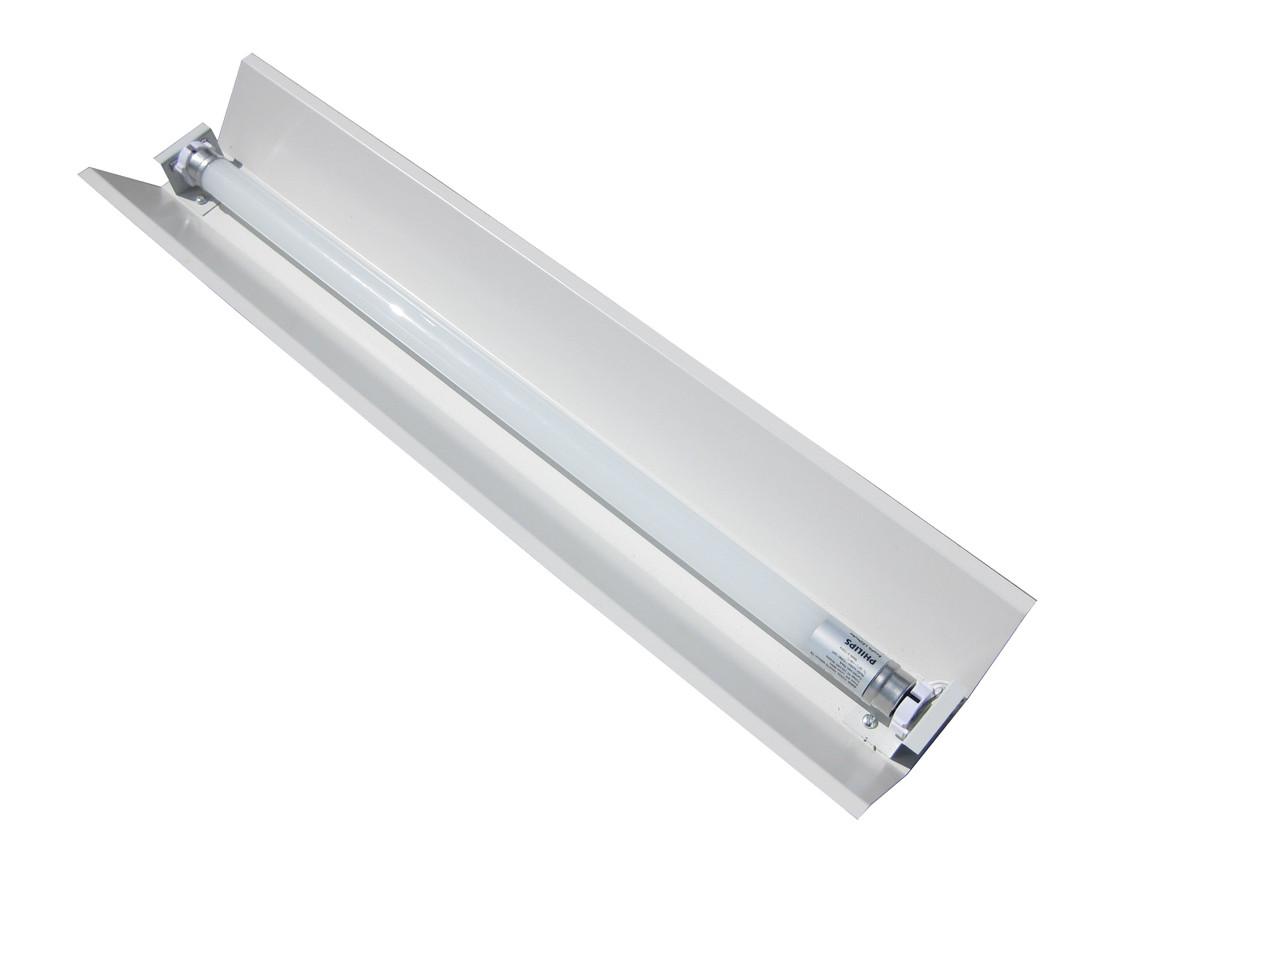 СПВ-01 (1х1200 компакт) открытый линейный светильник под LED (ЛЕД) лампы Т8 1200 без ПРА